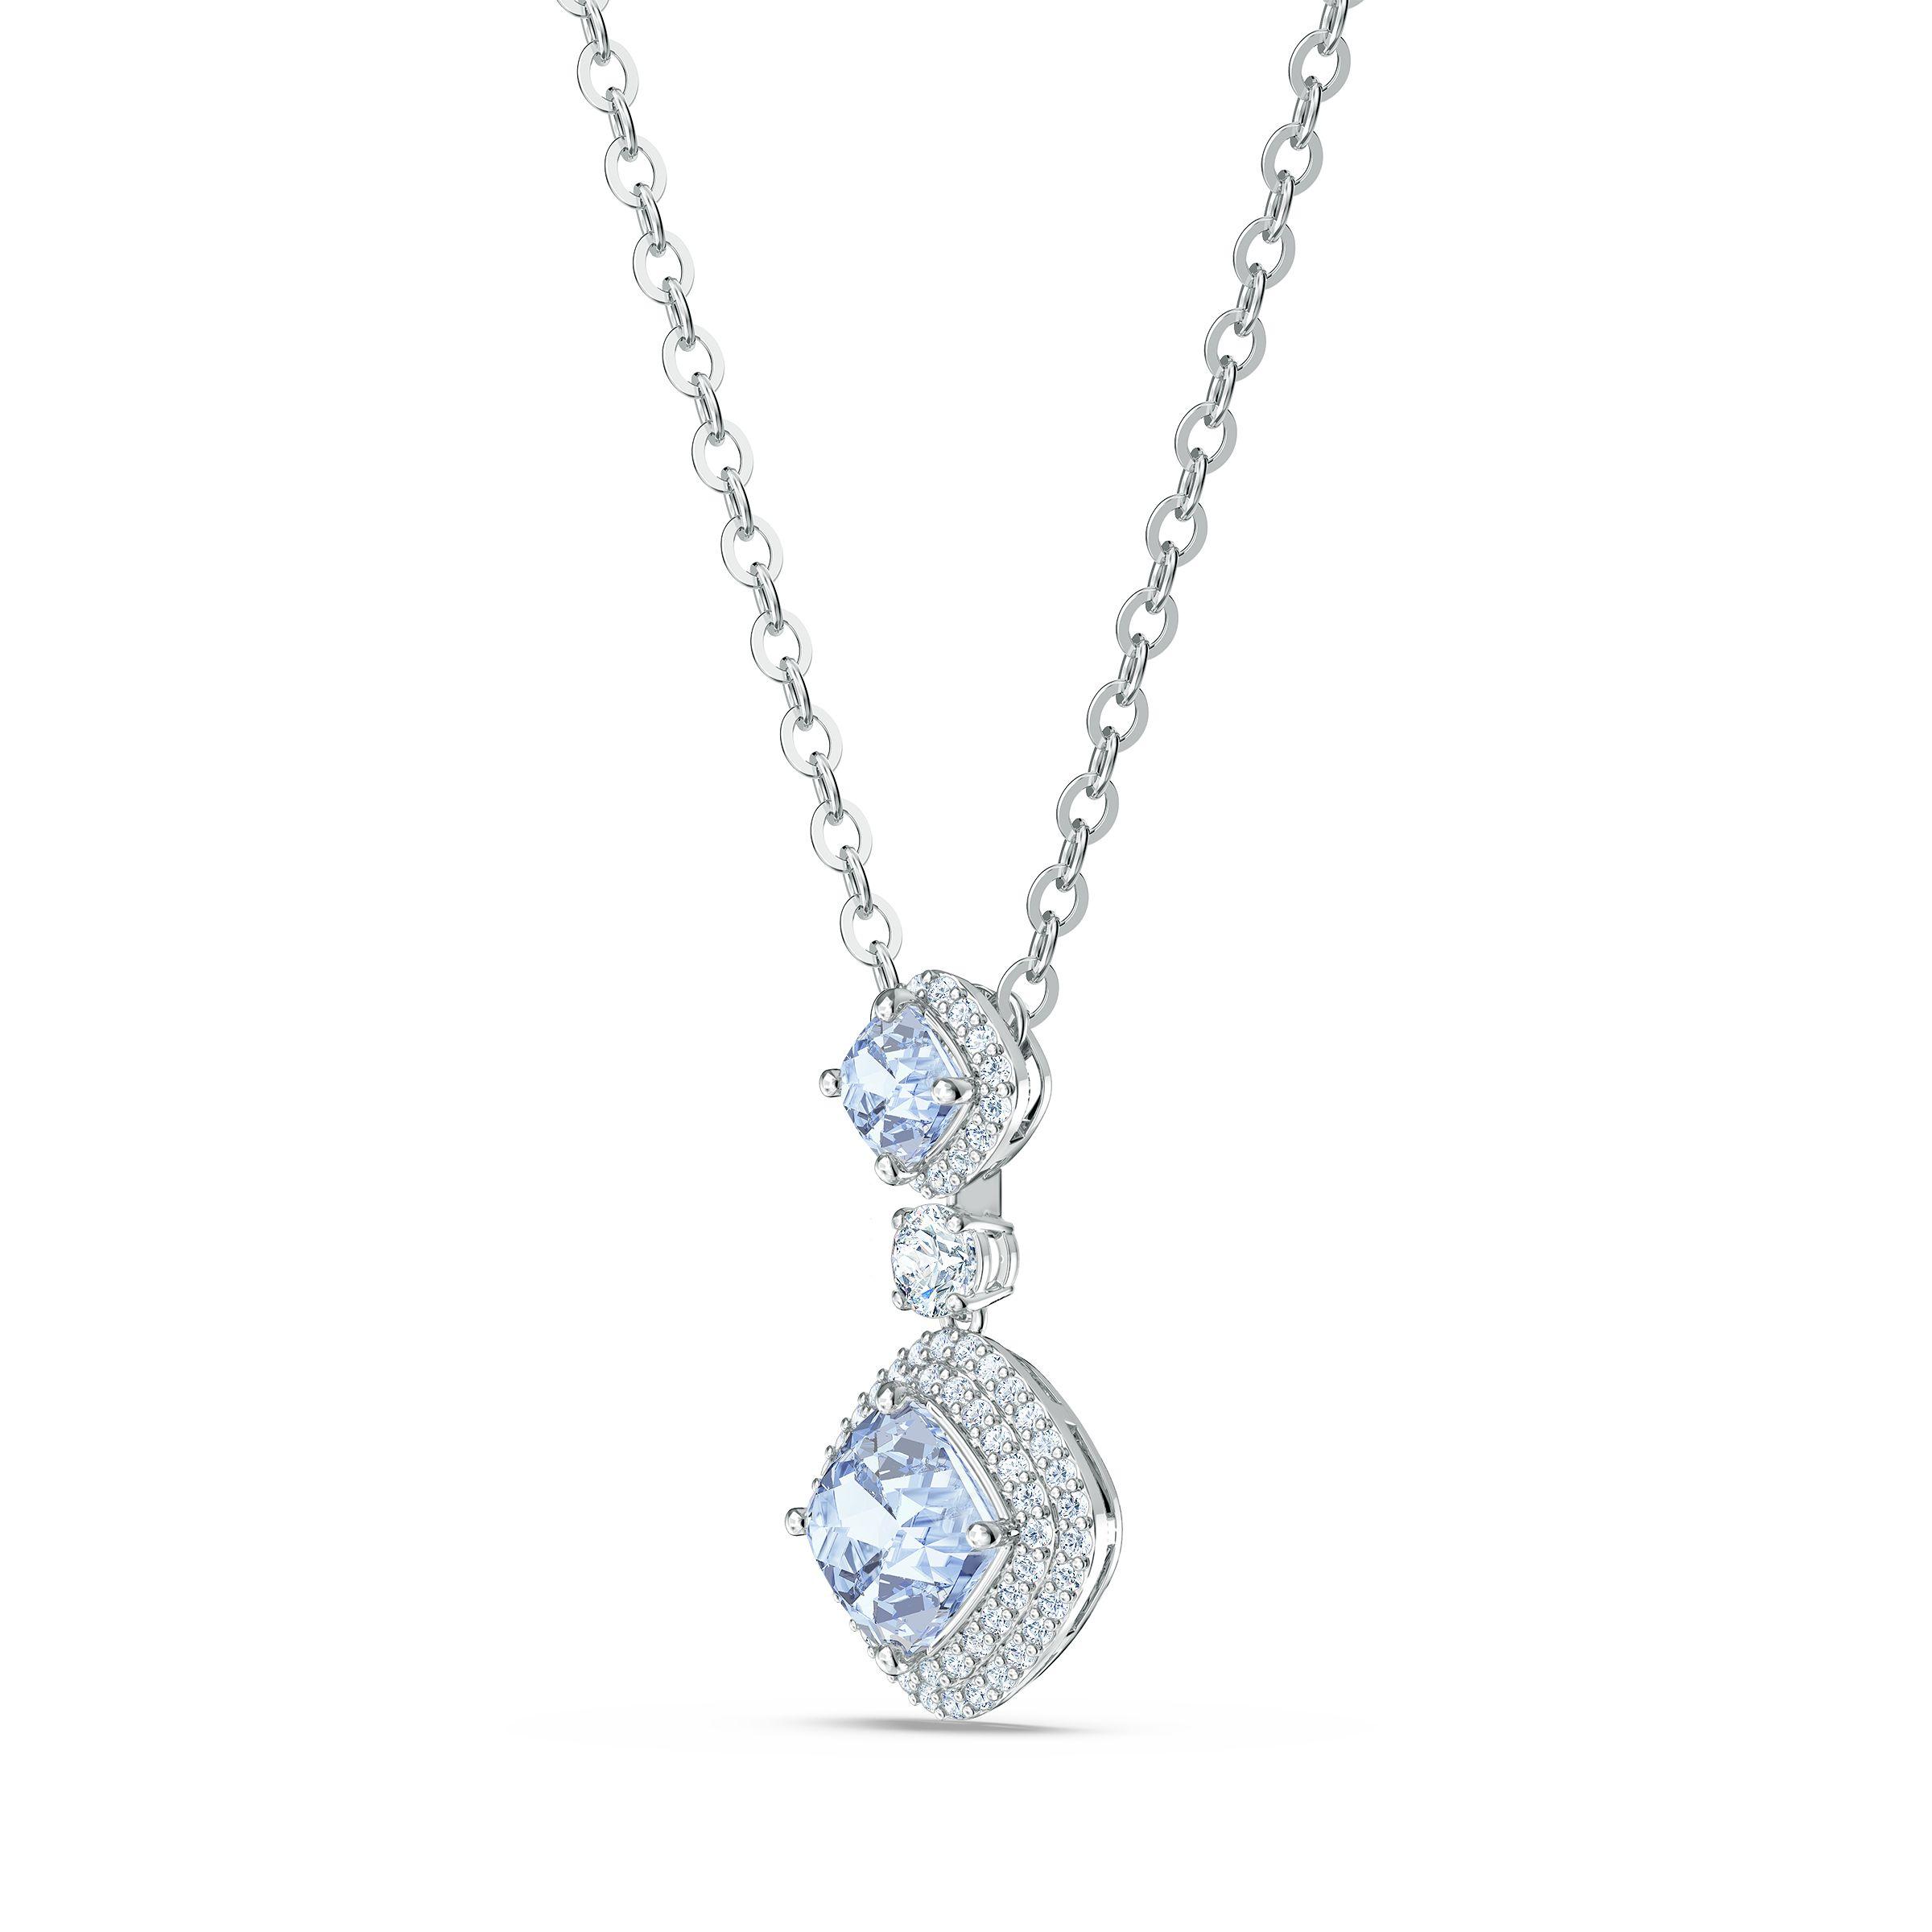 Collier Angelic, bleu, métal rhodié, Swarovski